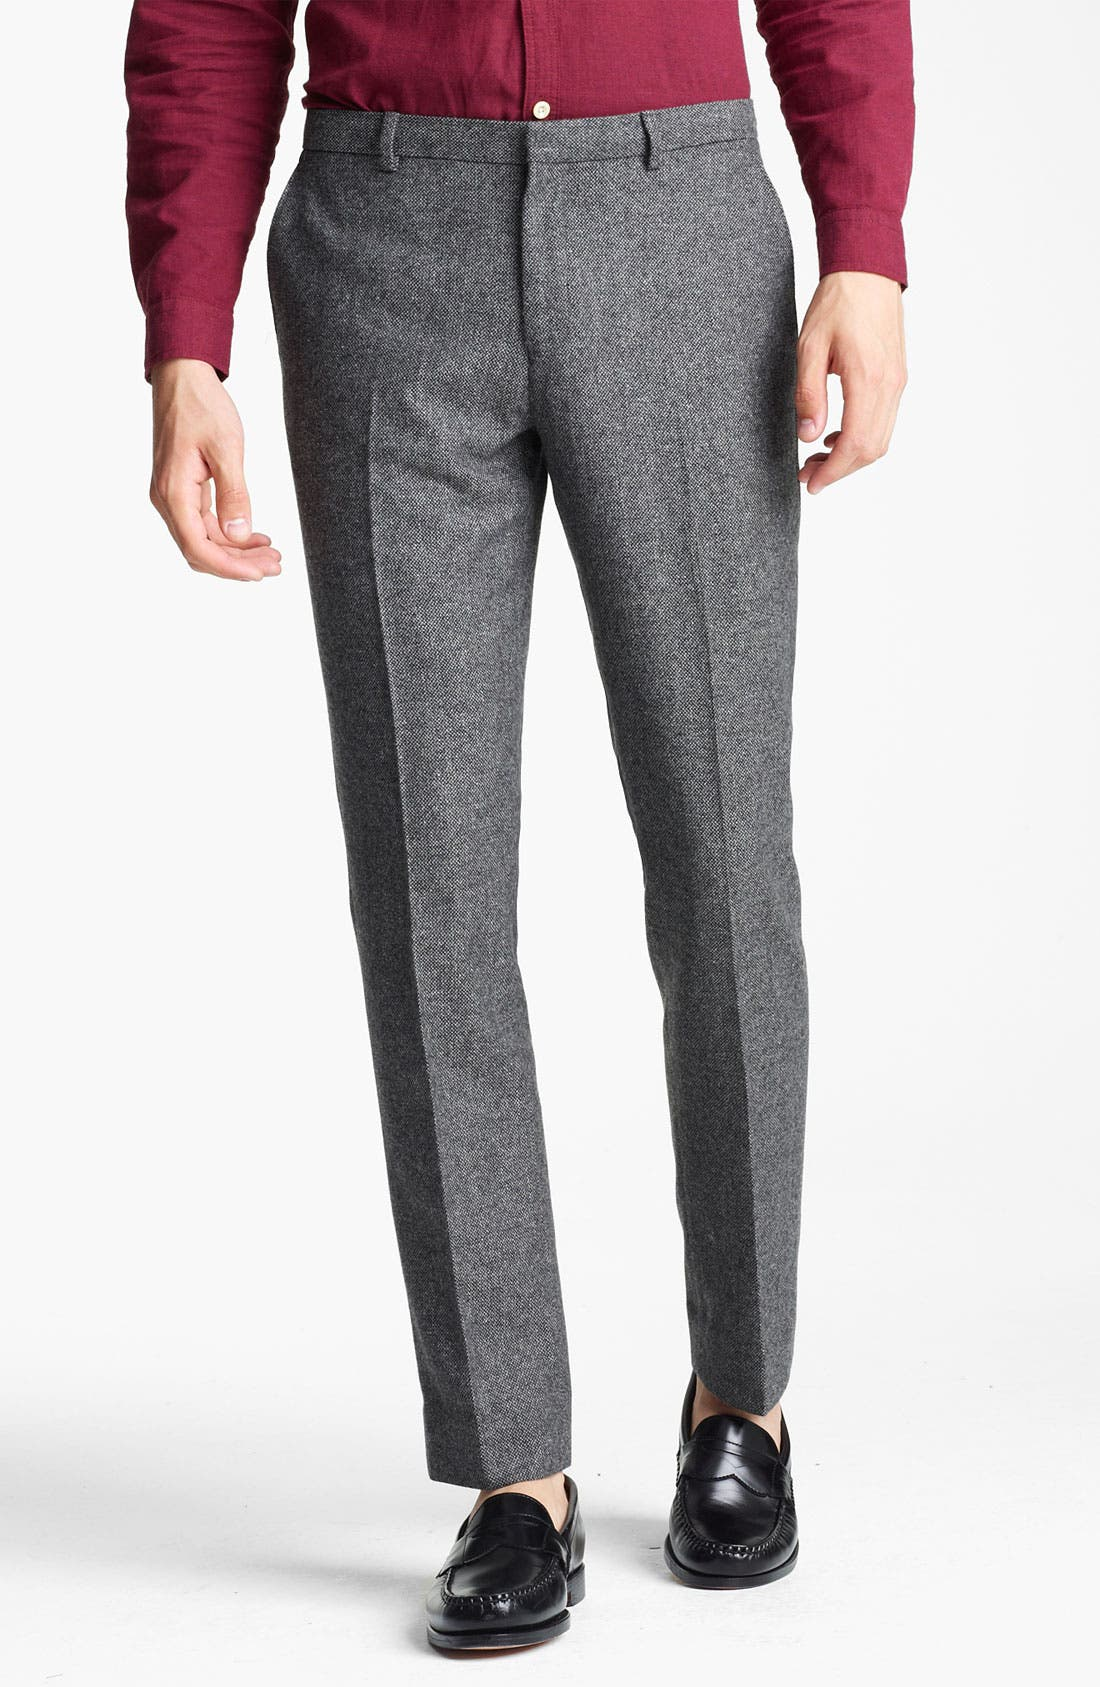 TOPMAN, 'Vento' Tweed Skinny Trousers, Main thumbnail 1, color, 020